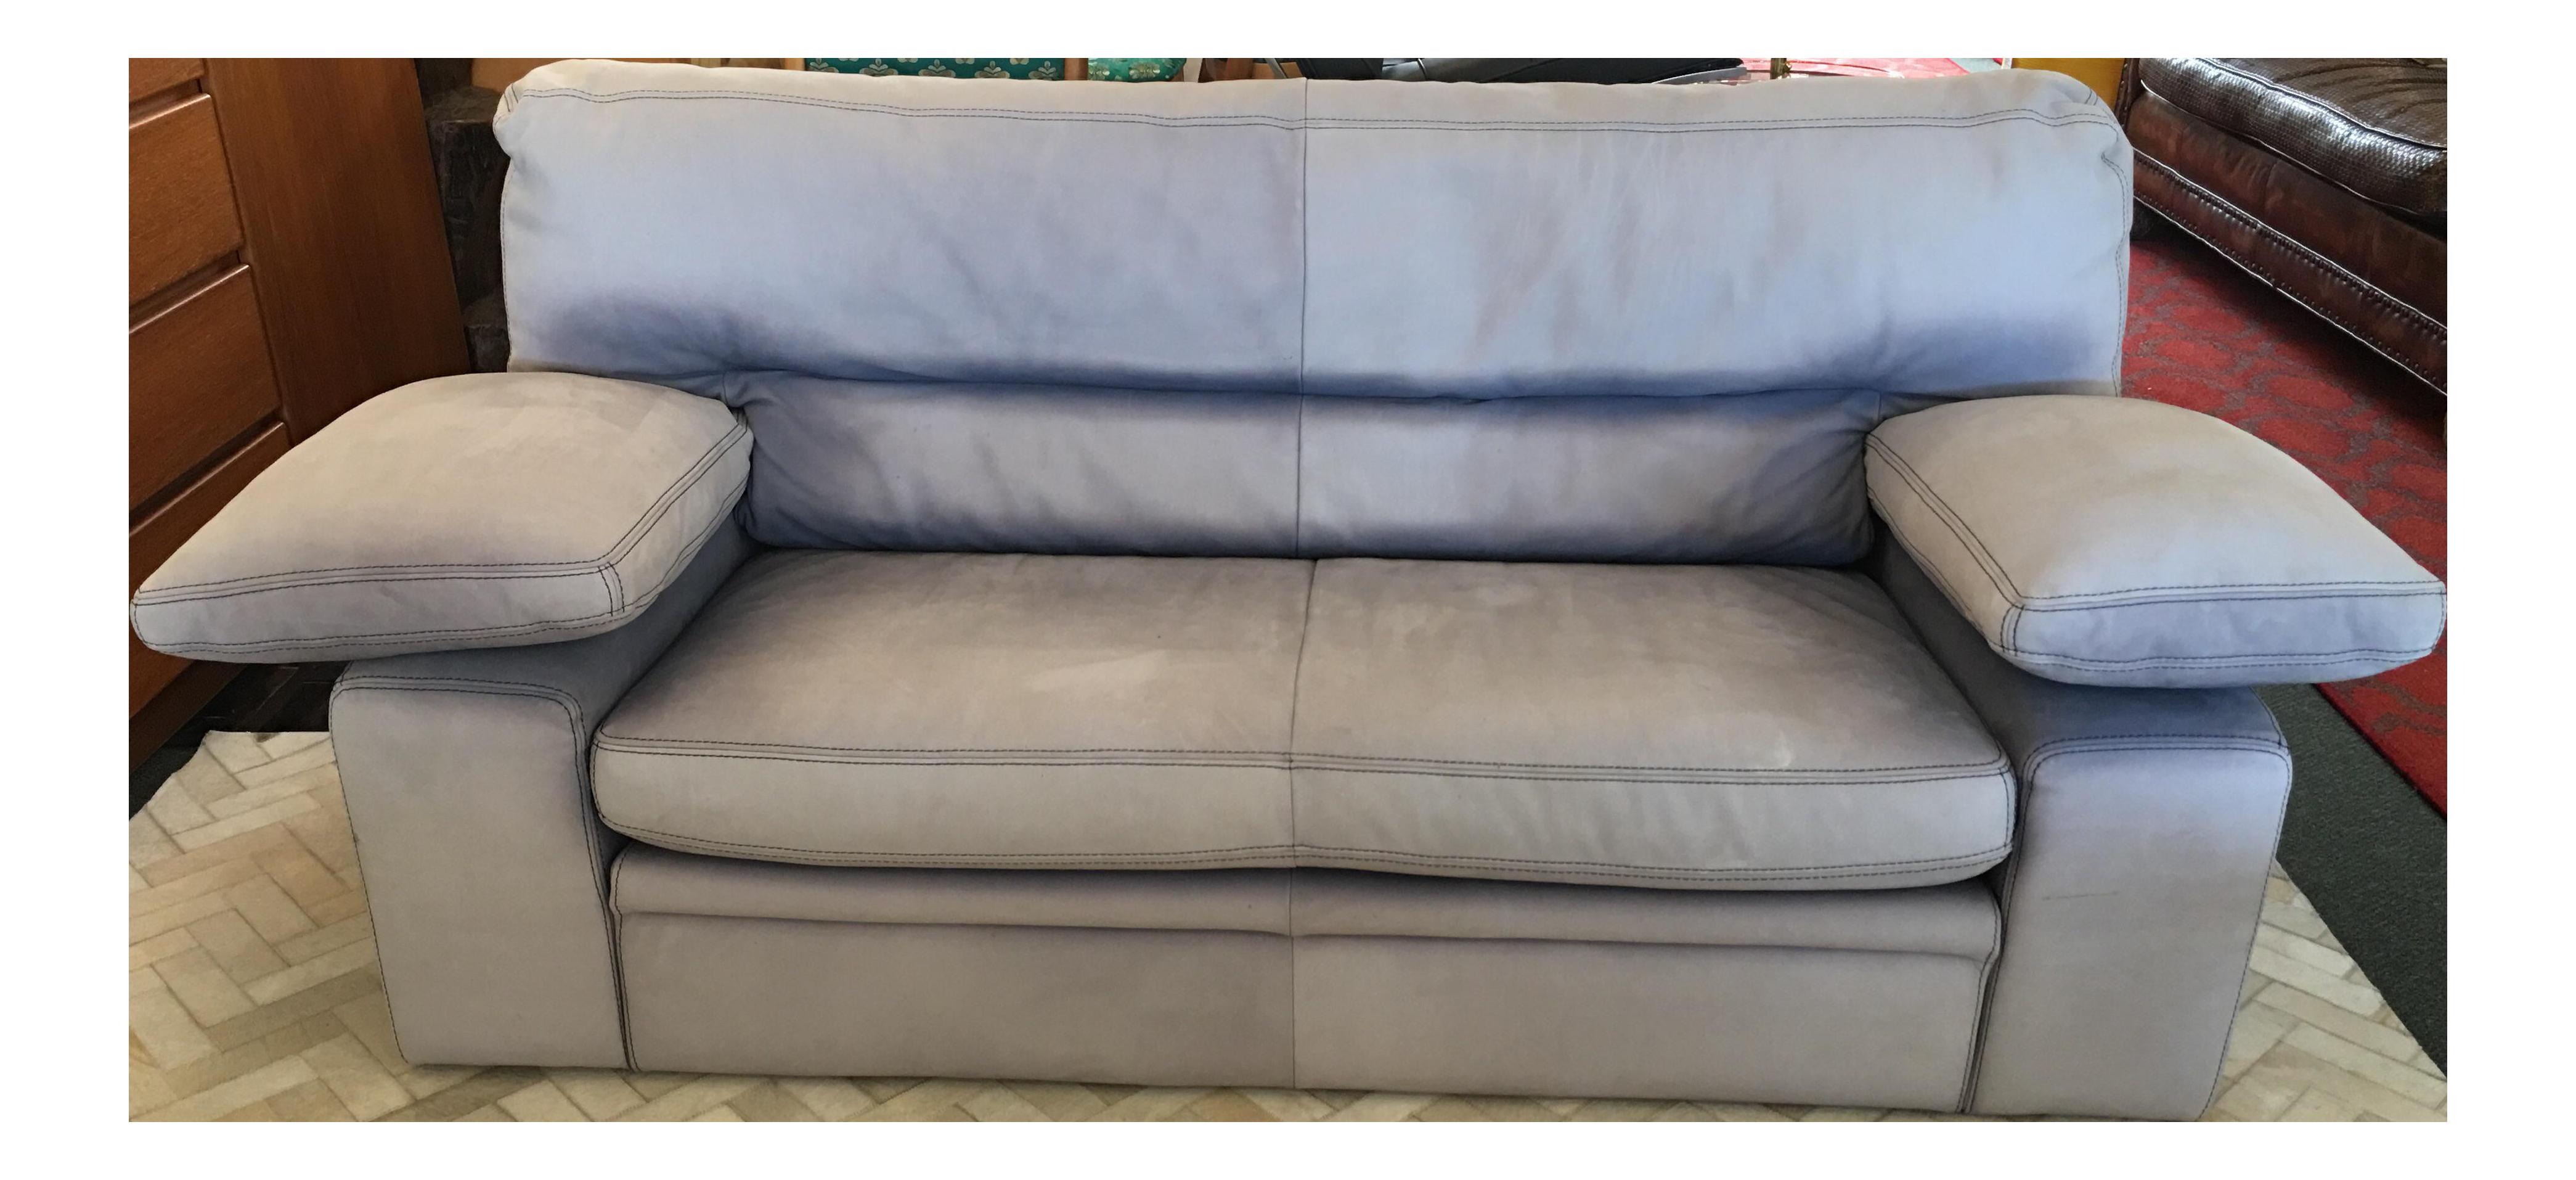 vintage roche bobois leather sofa chairish. Black Bedroom Furniture Sets. Home Design Ideas